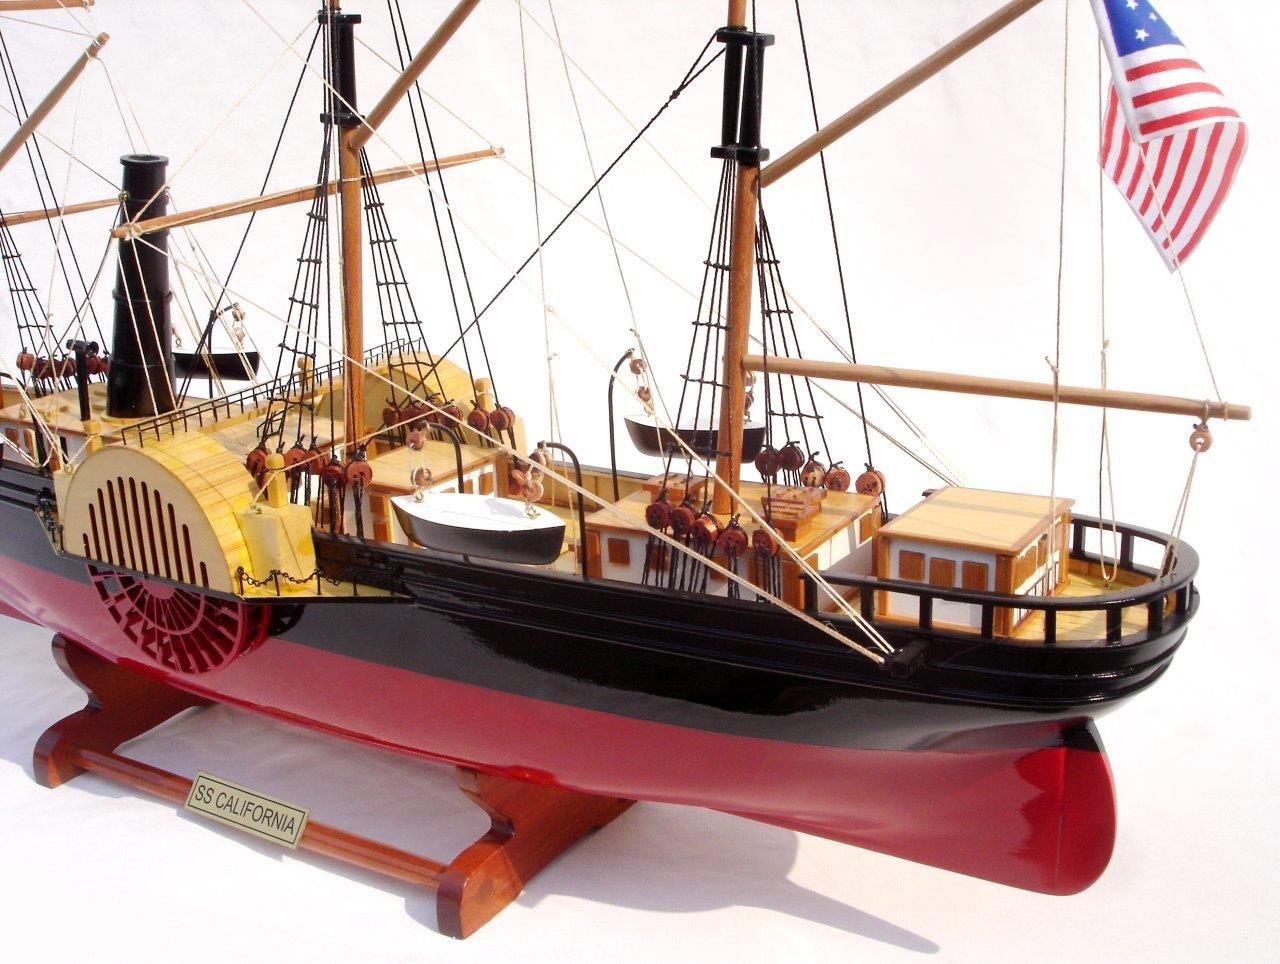 2054-12160-SS-Califonia-ship-model